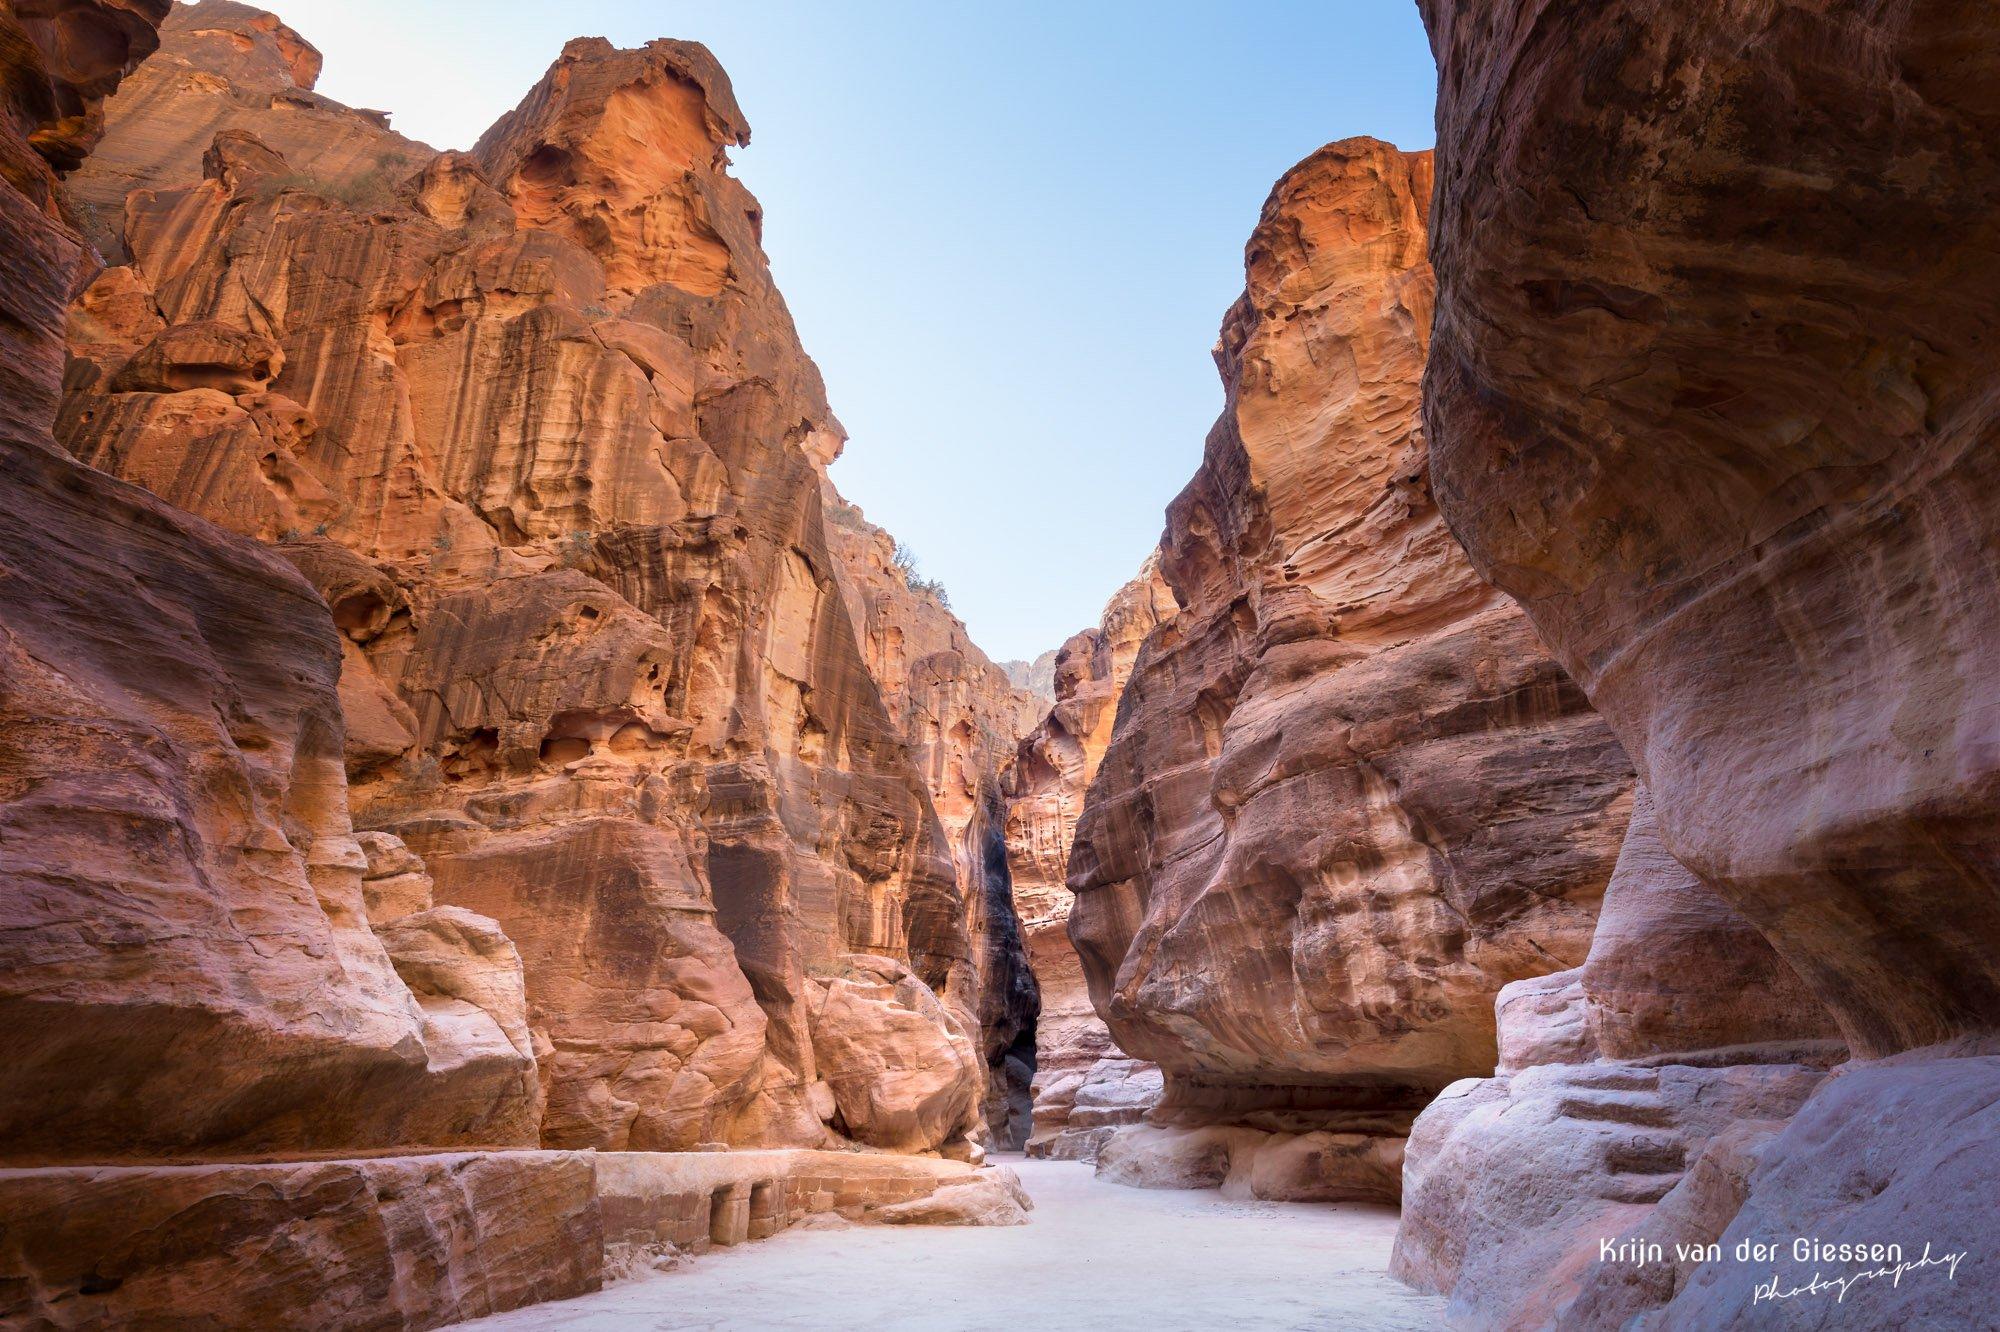 Petra gorge without tourists tutorial by Krijn van der Giessen Photography